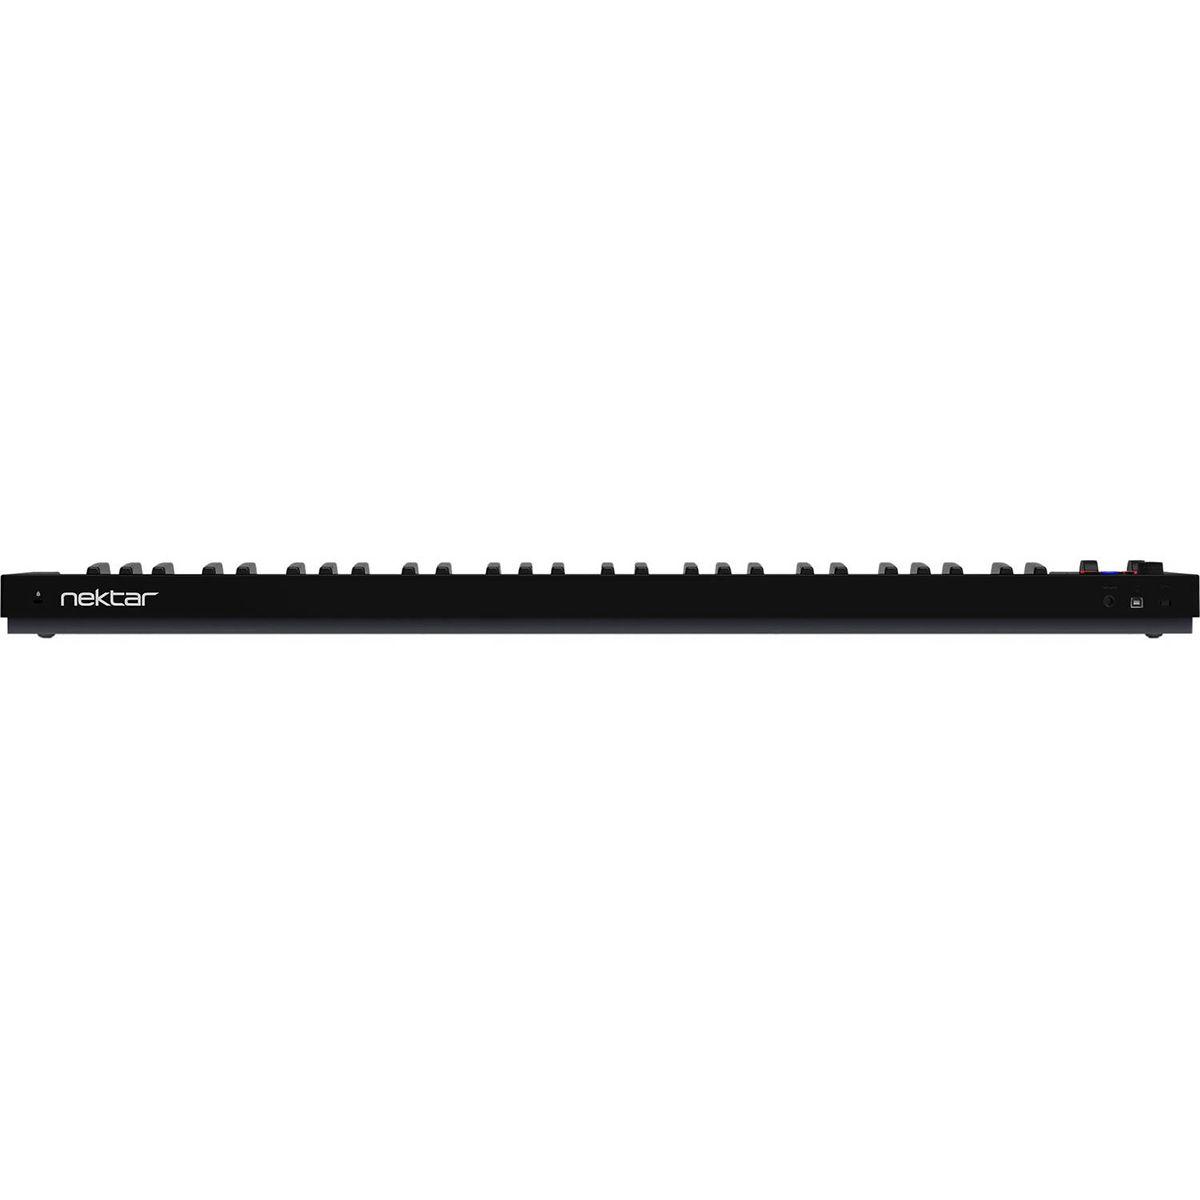 TECLADO CONTROLADOR MIDI NEKTAR IMPACT GX61